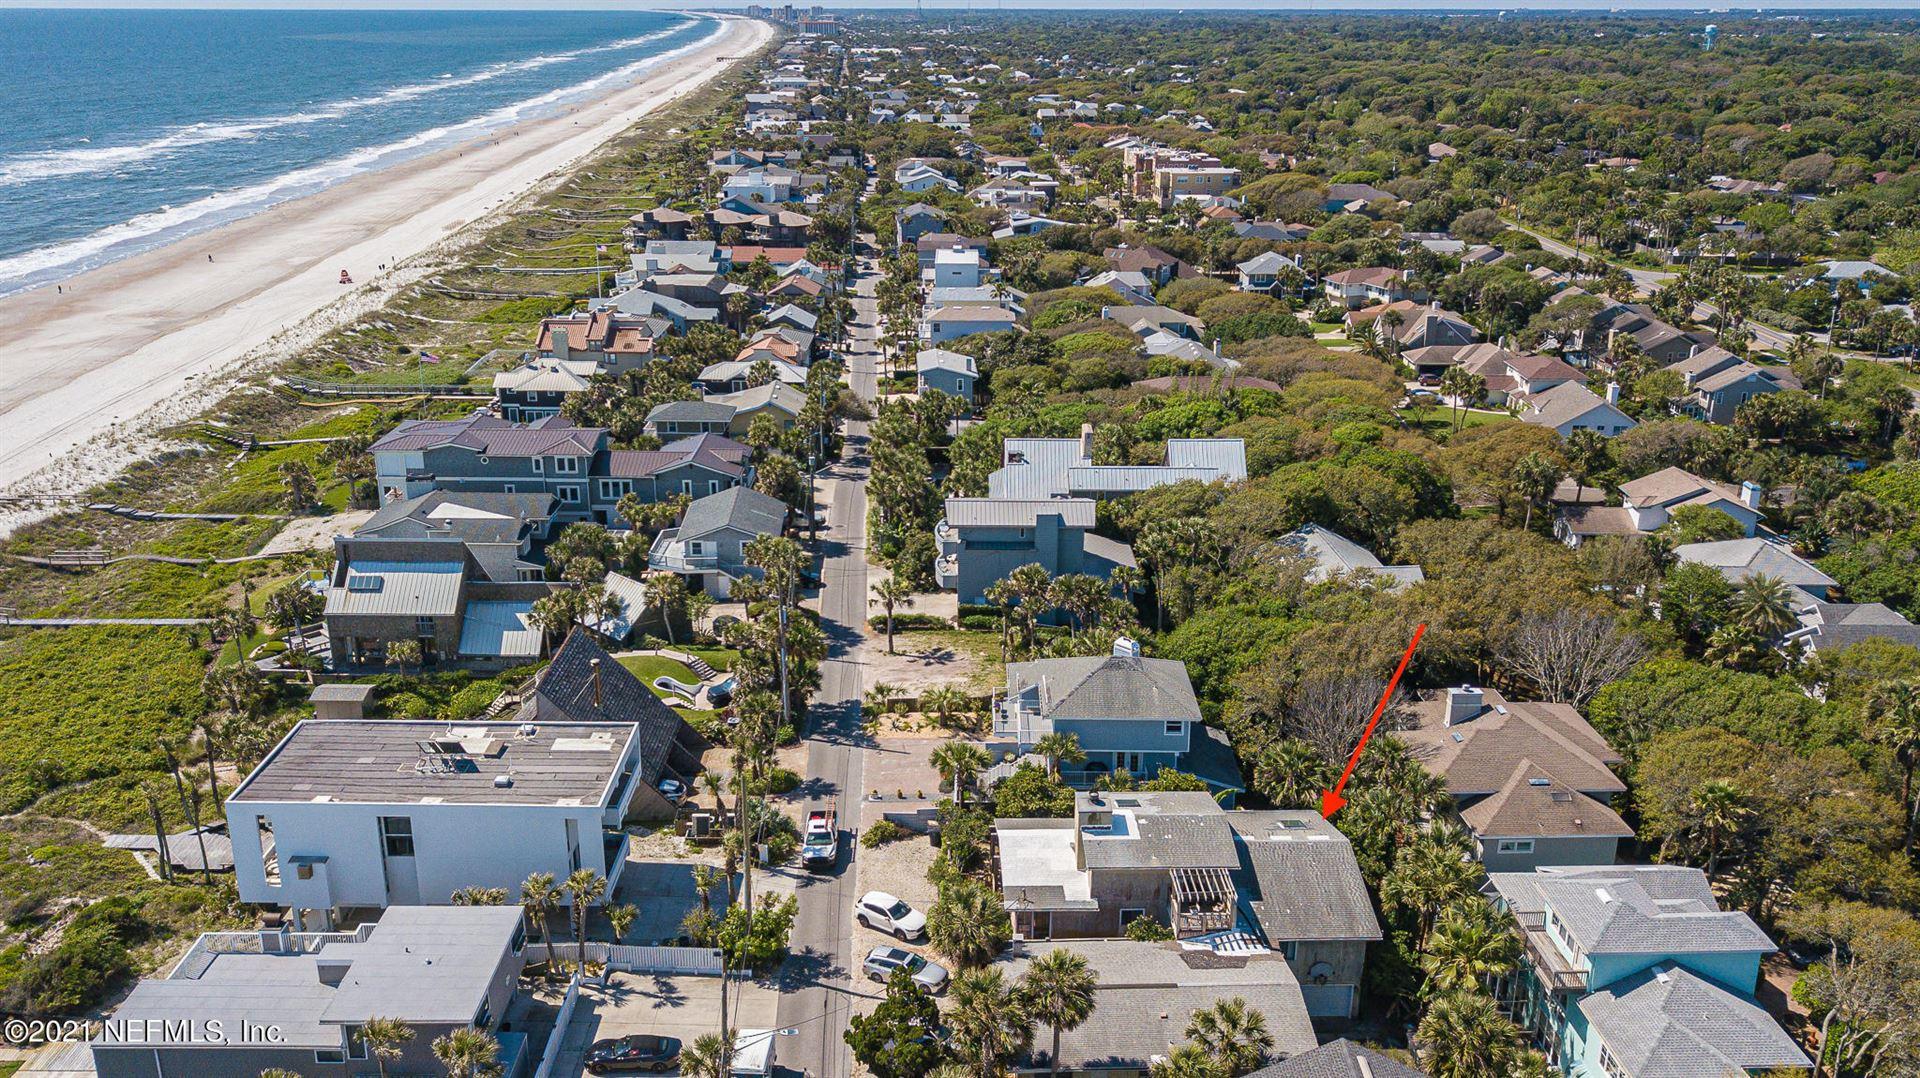 1950 BEACH AVE, Atlantic Beach, FL 32233 - MLS#: 1106469